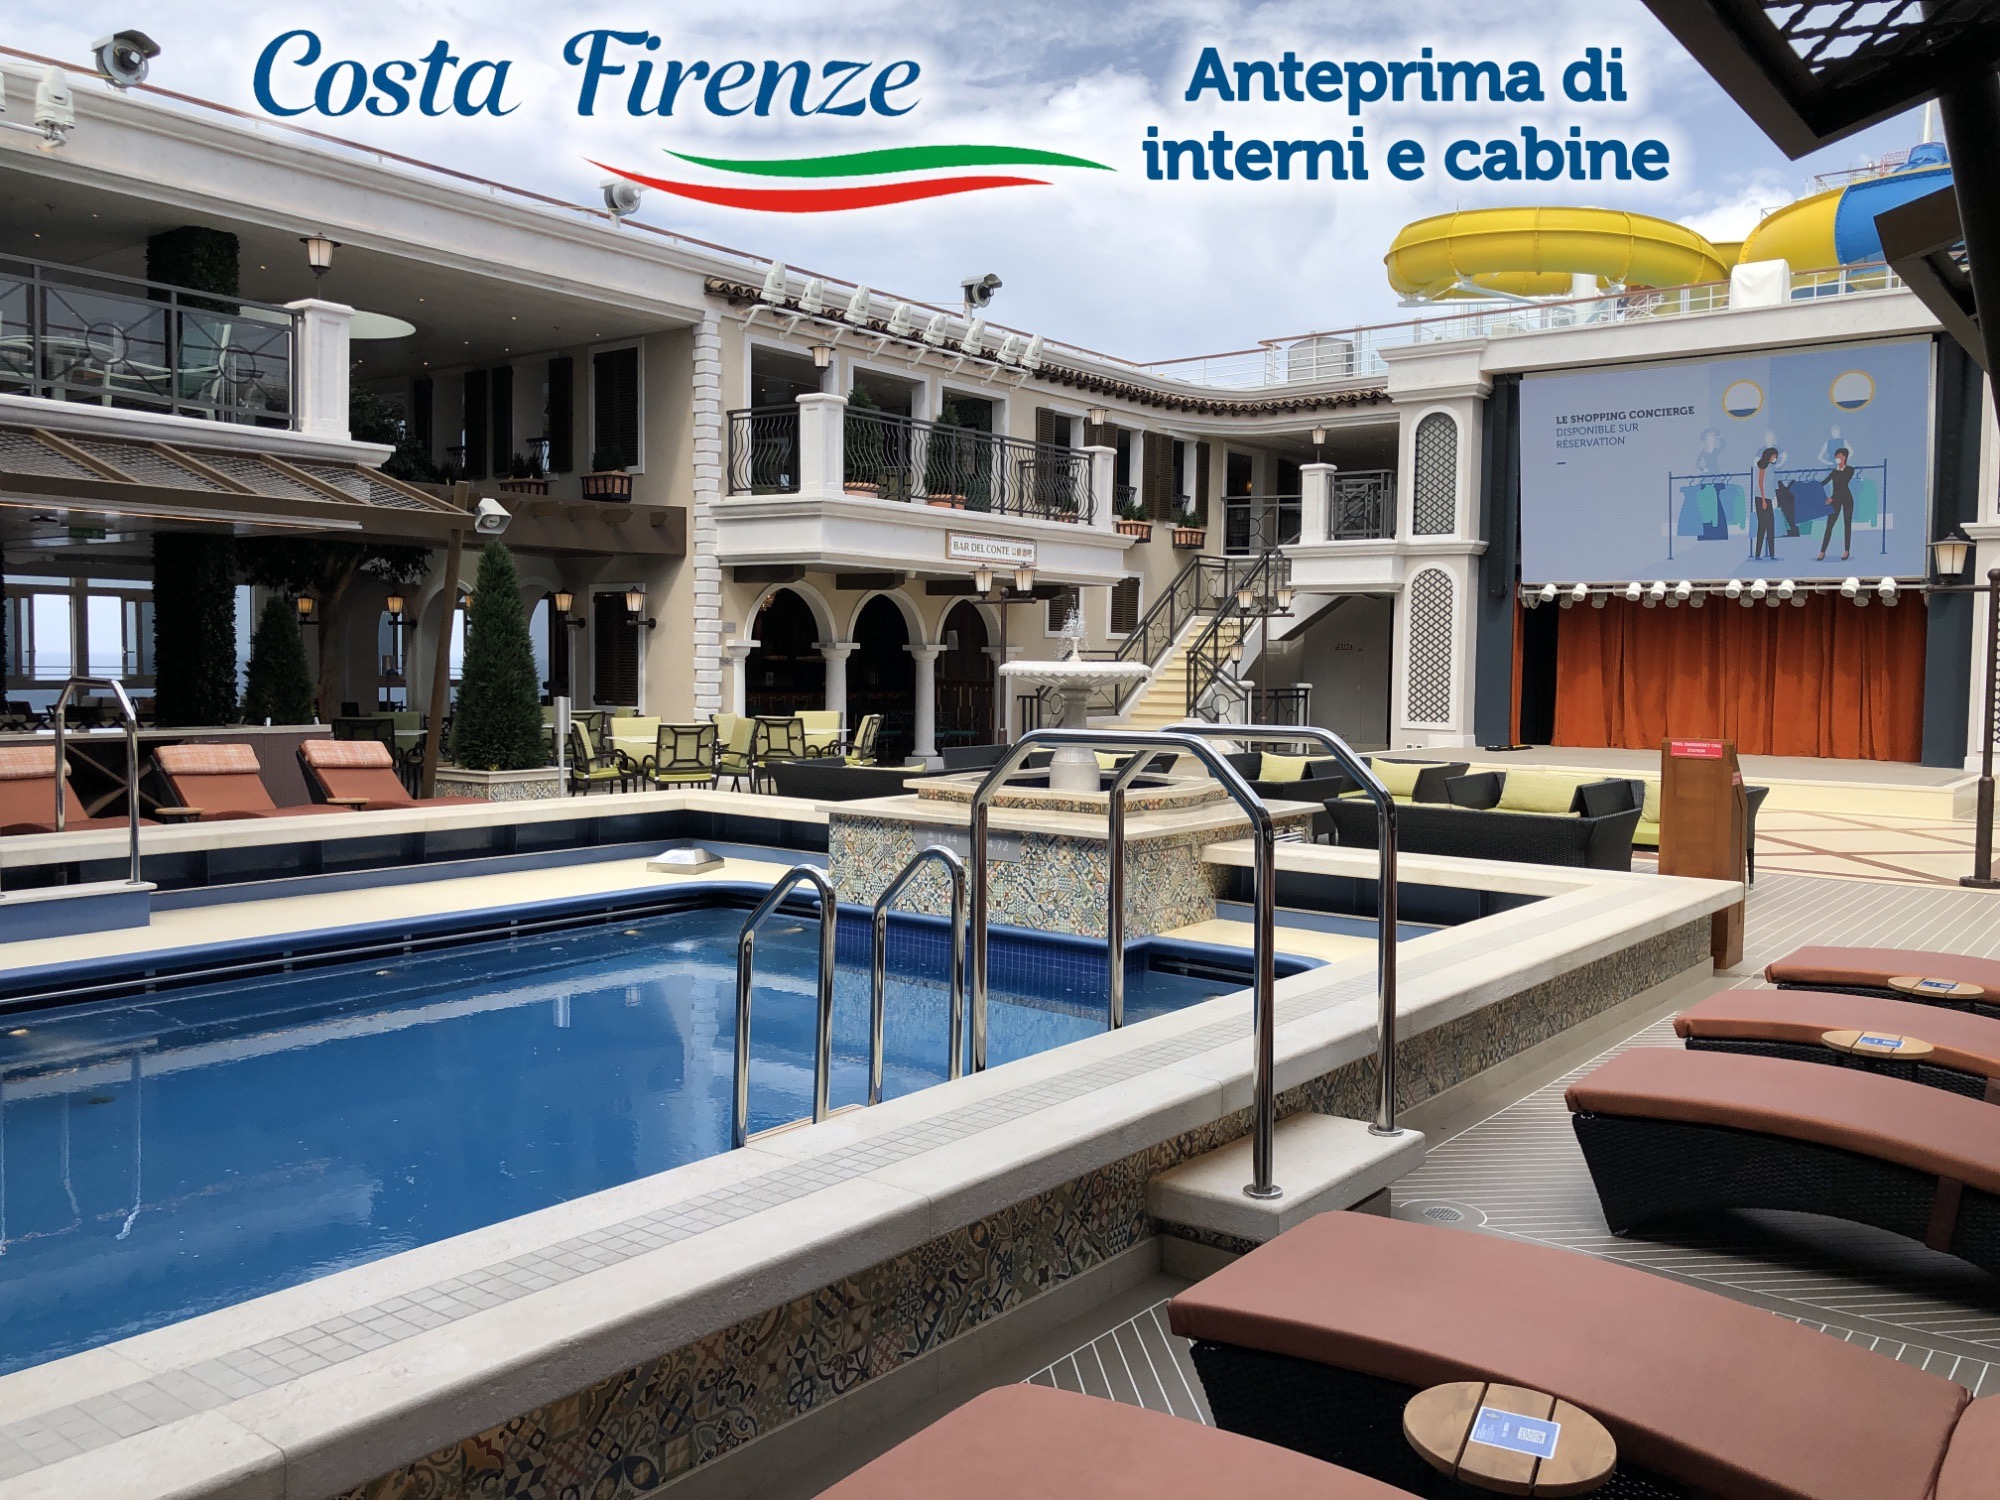 costafirenzefotointerni-1624995557.jpg